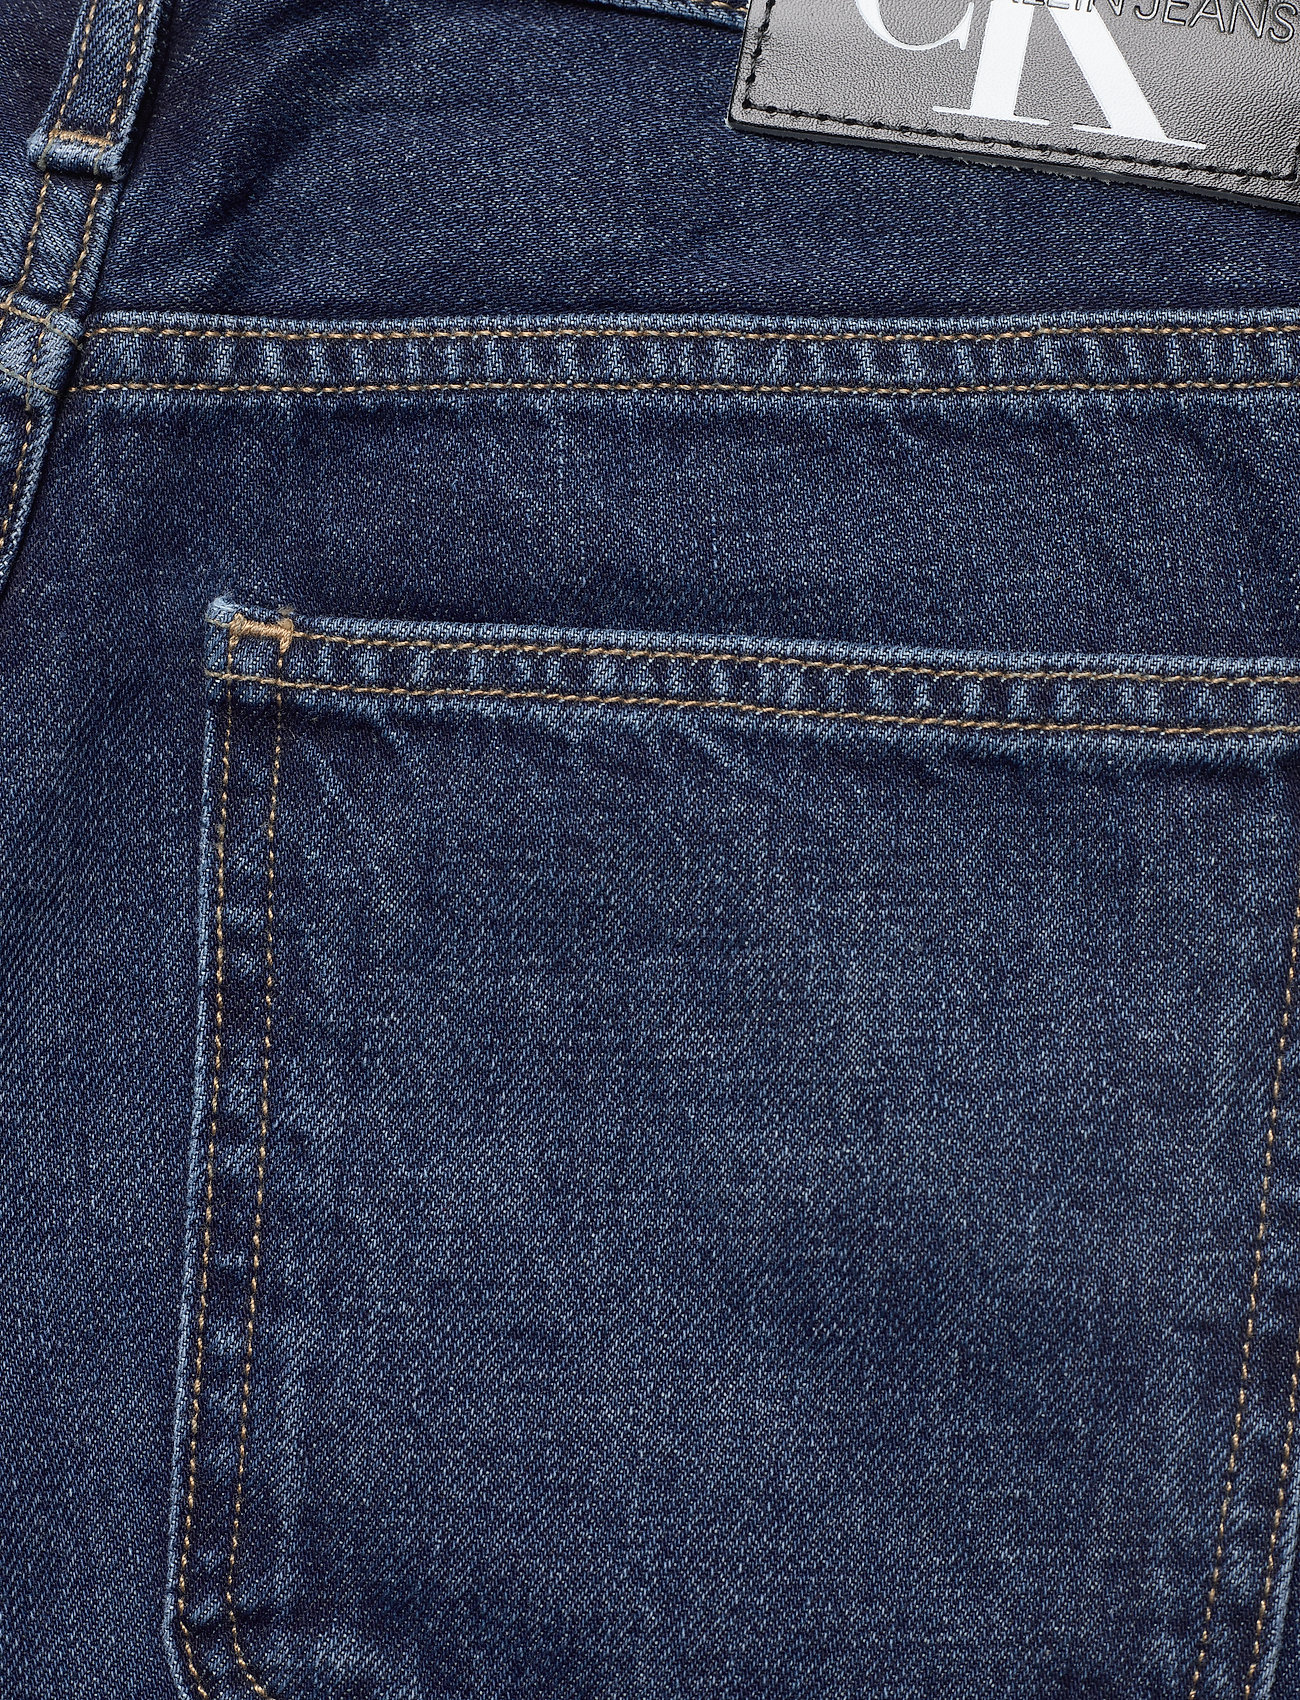 Calvin Klein Jeans - MOM JEAN - straight regular - bb139 - dark blue utility - 4